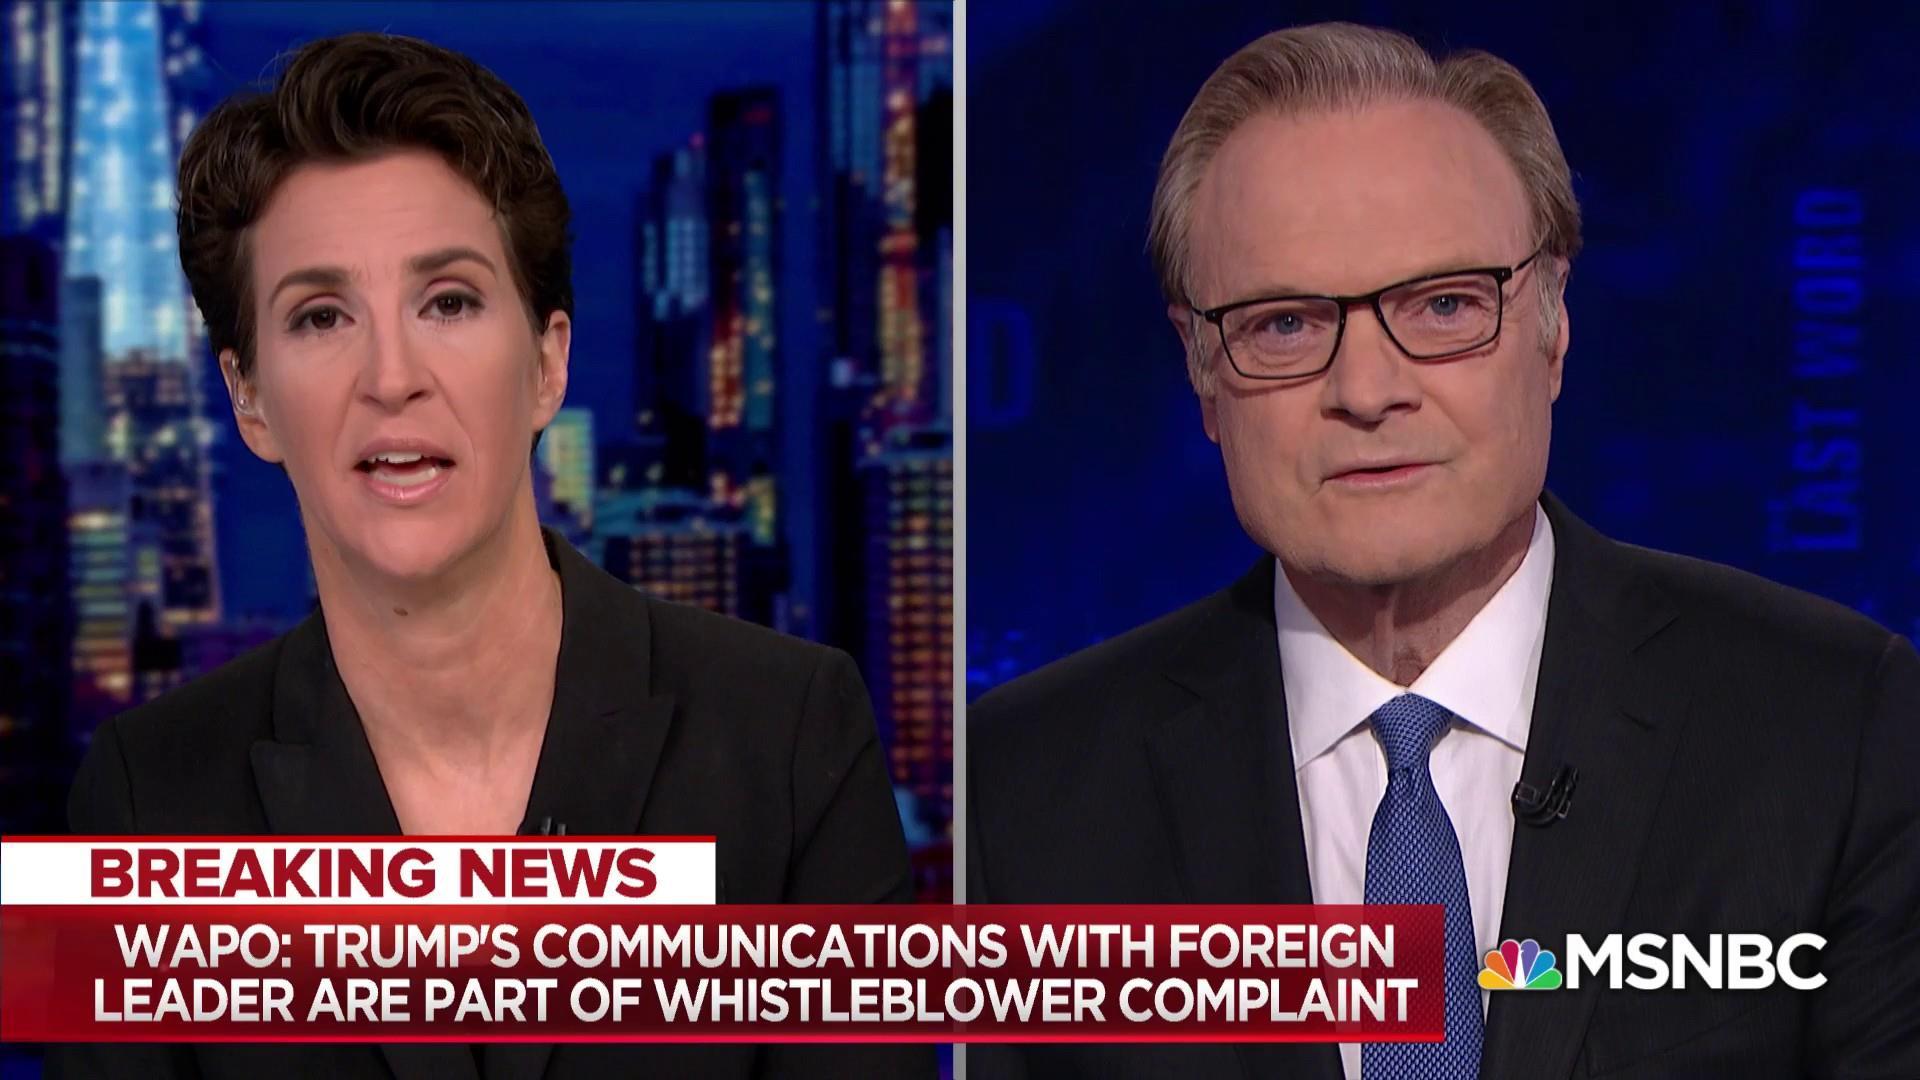 Trump admin antics exposes good faith whistleblower to risk